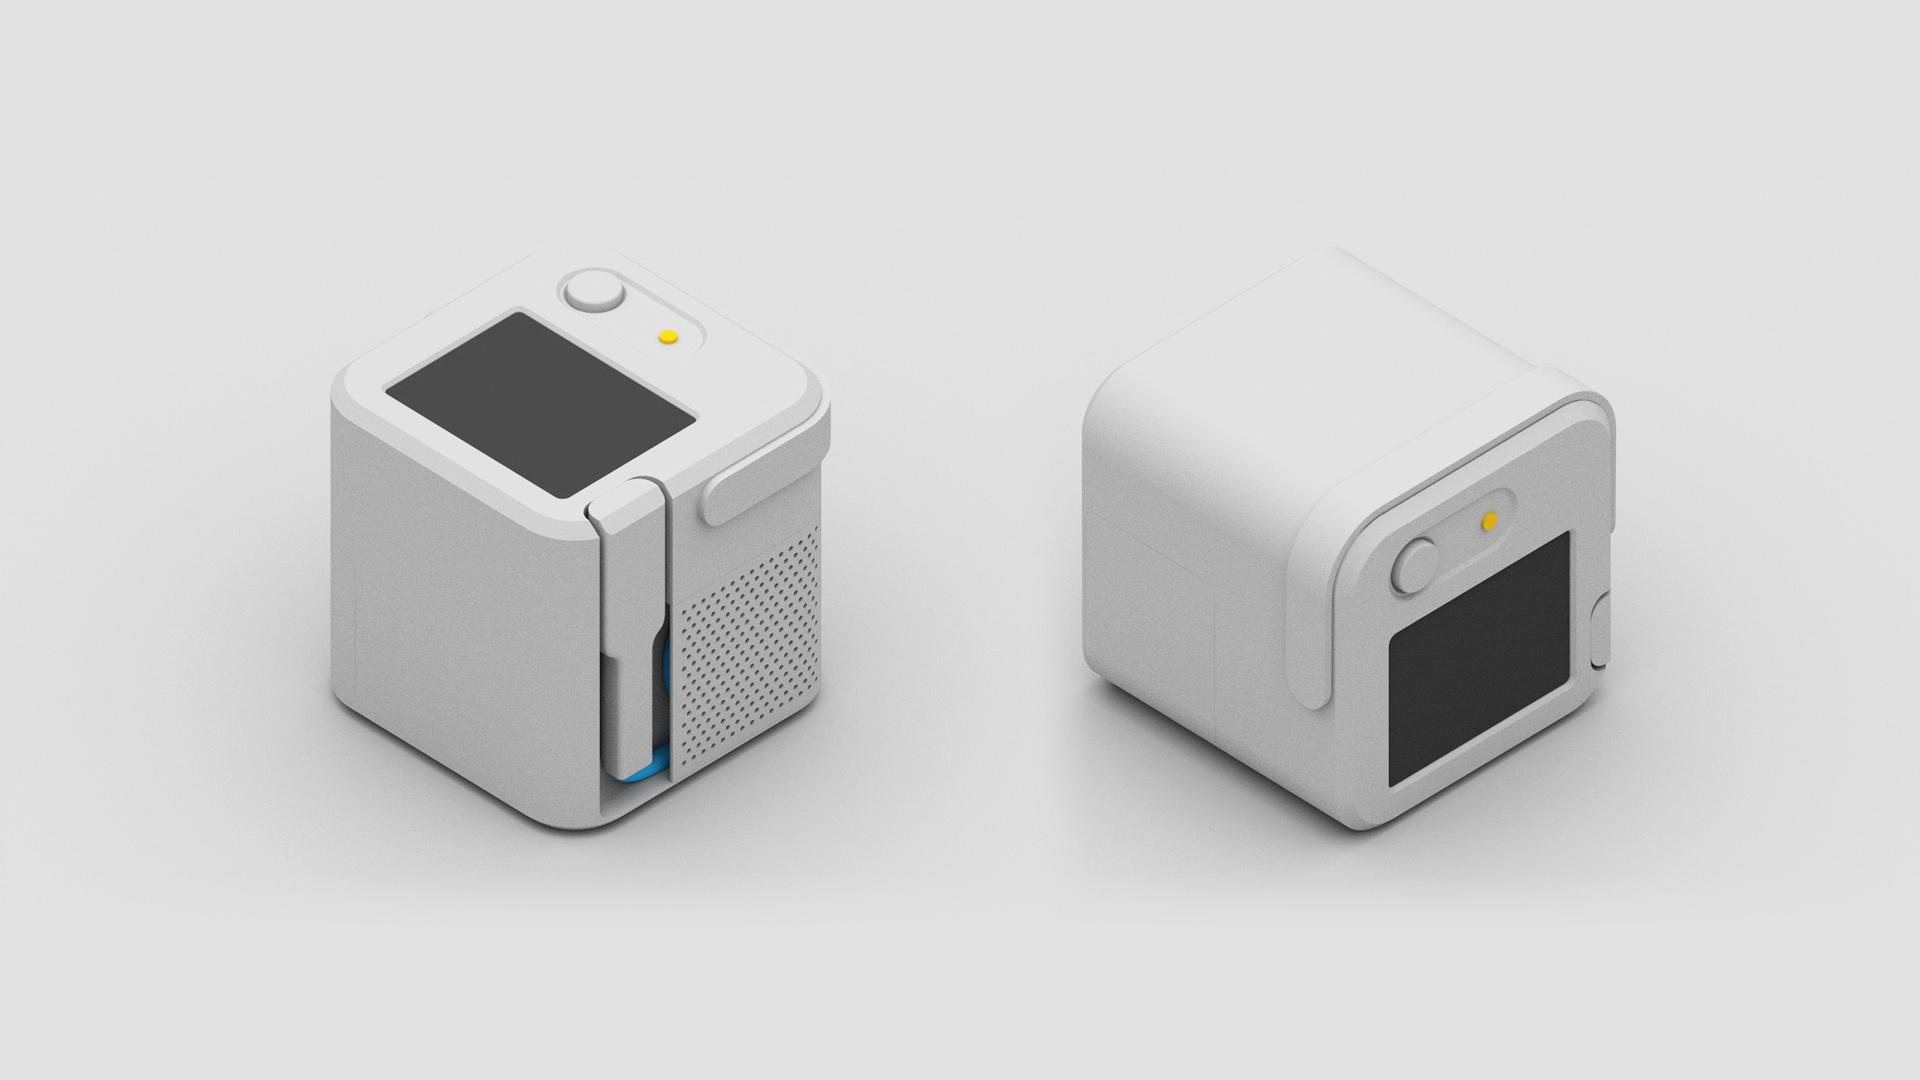 cube_page_01.jpg